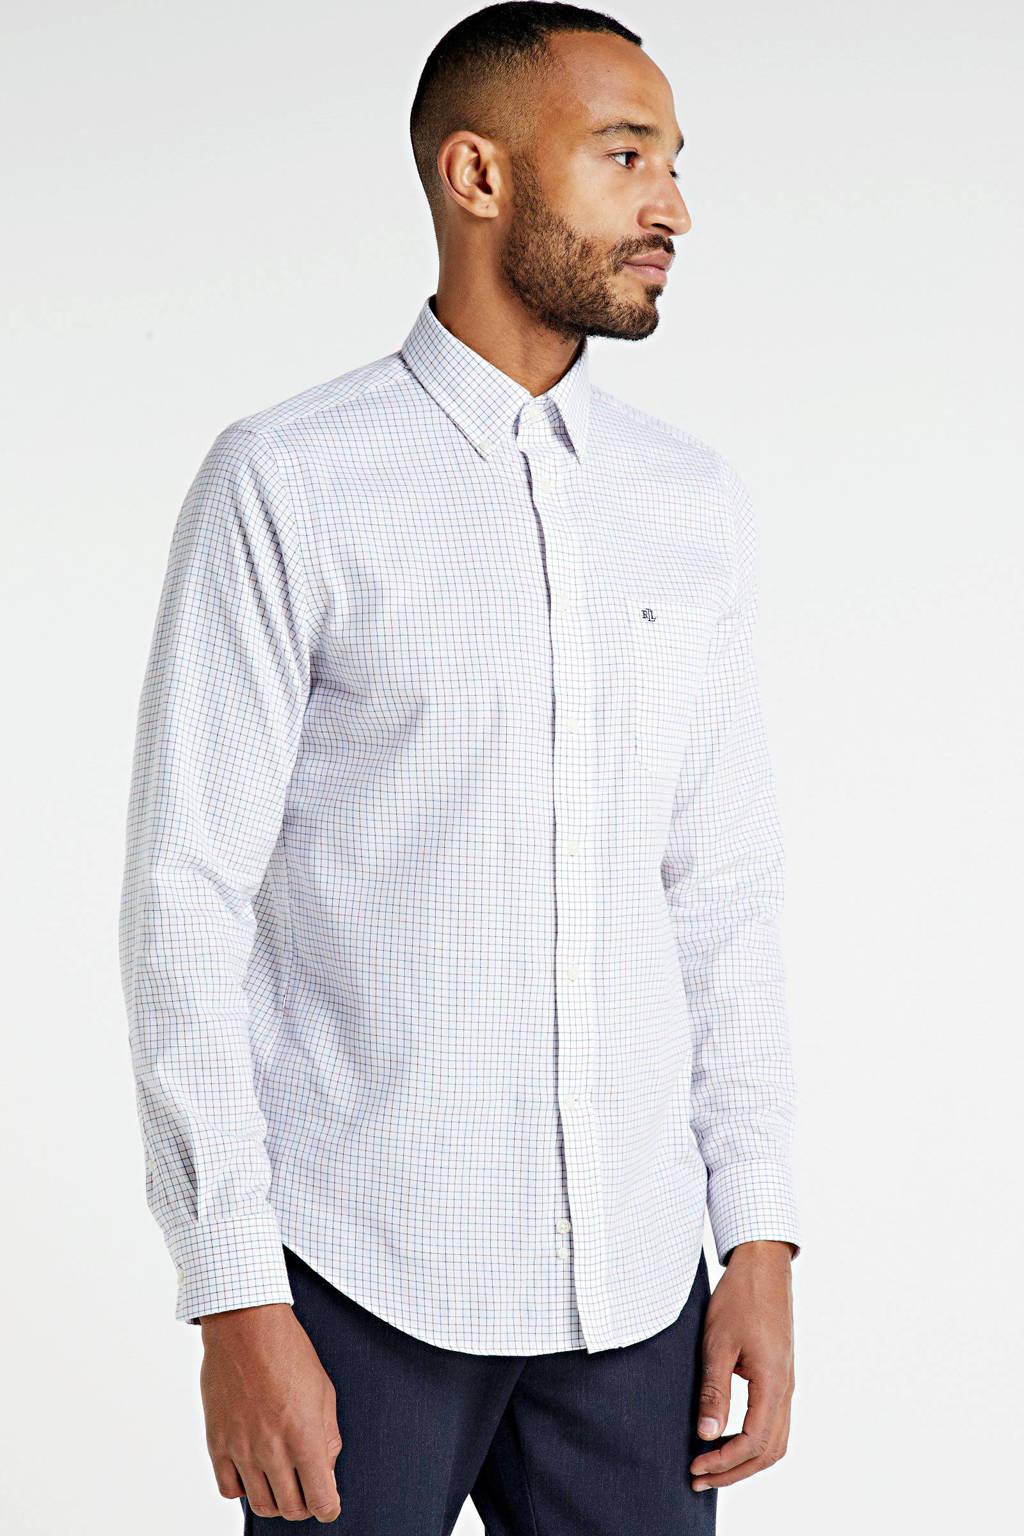 POLO Ralph Lauren geruit slim fit overhemd wit/blauw, Wit/blauw